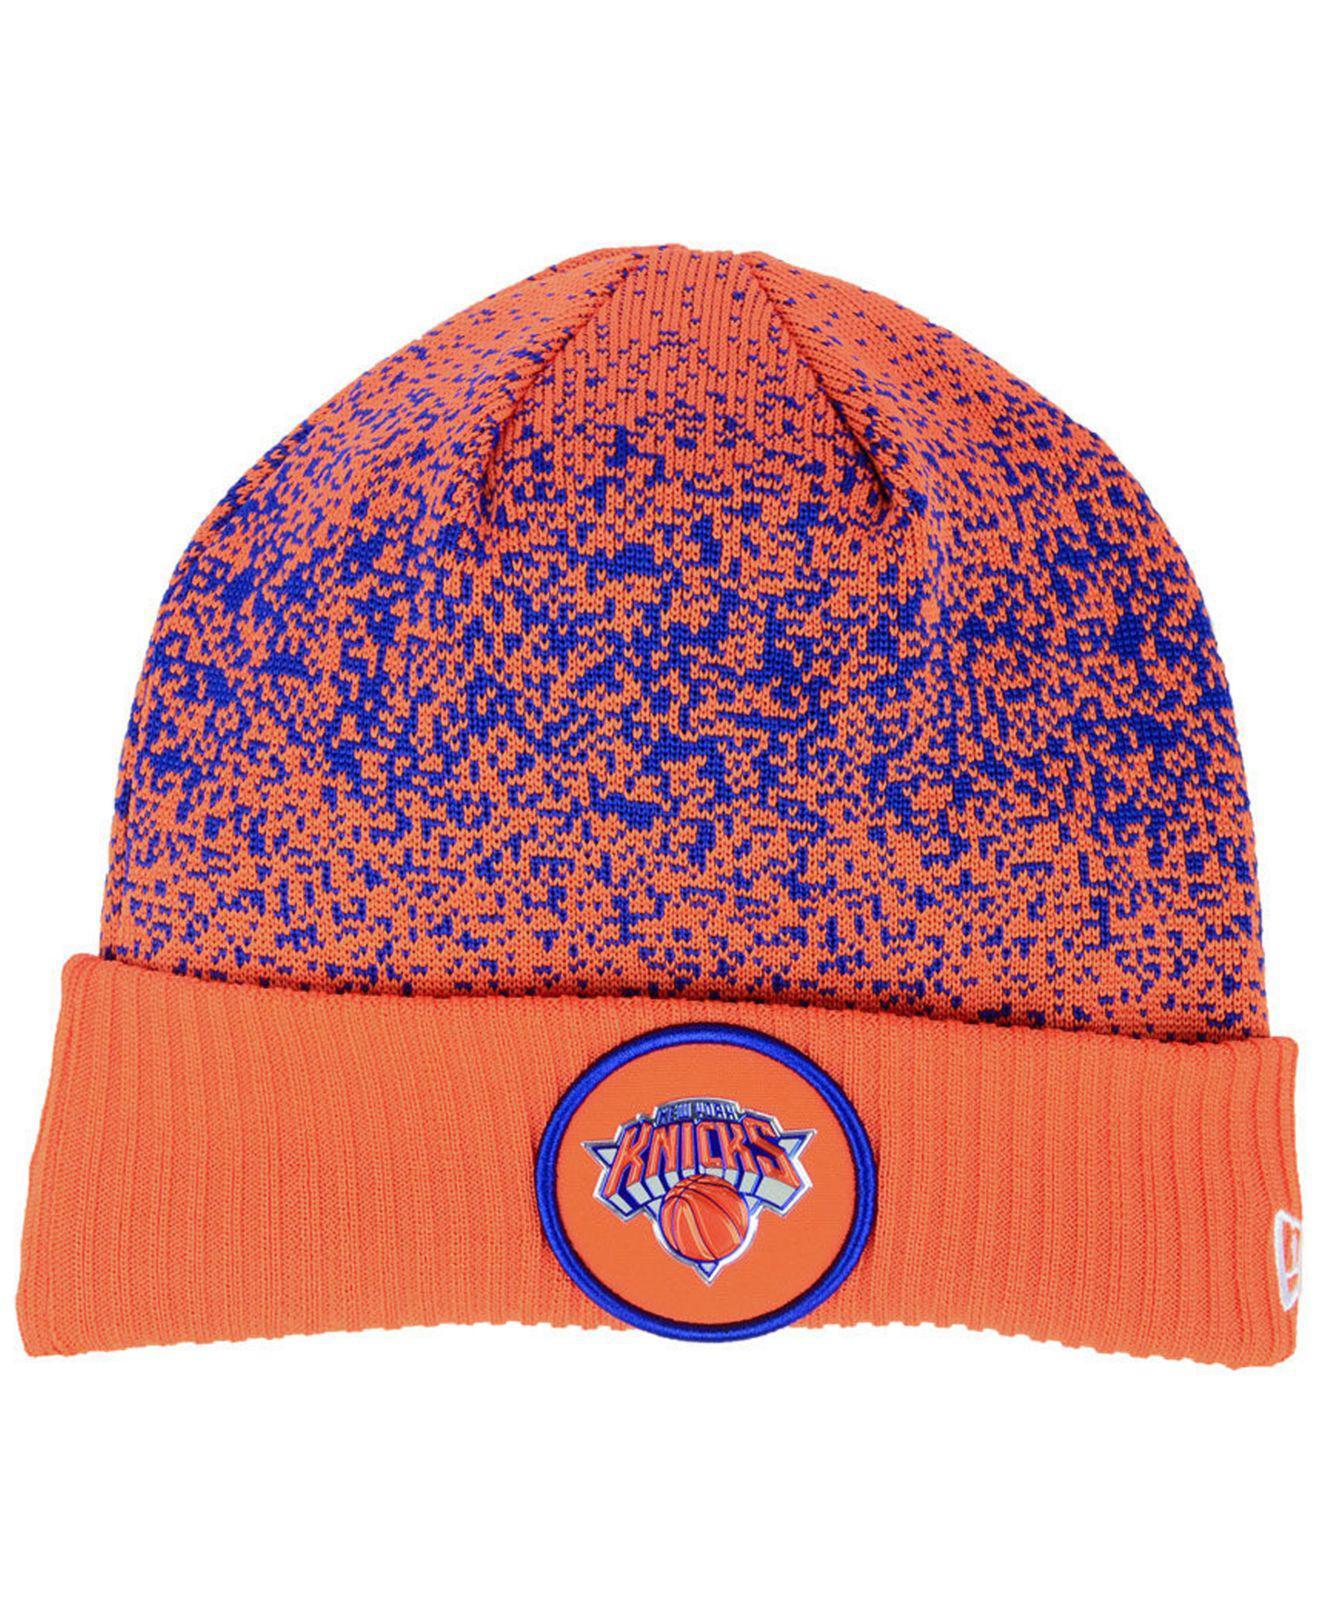 5bd85b329eb7 ... Shop; 81dd930f1659c Lyst - KTZ New York Knicks On Court Collection Cuff  Knit Hat for Men ...